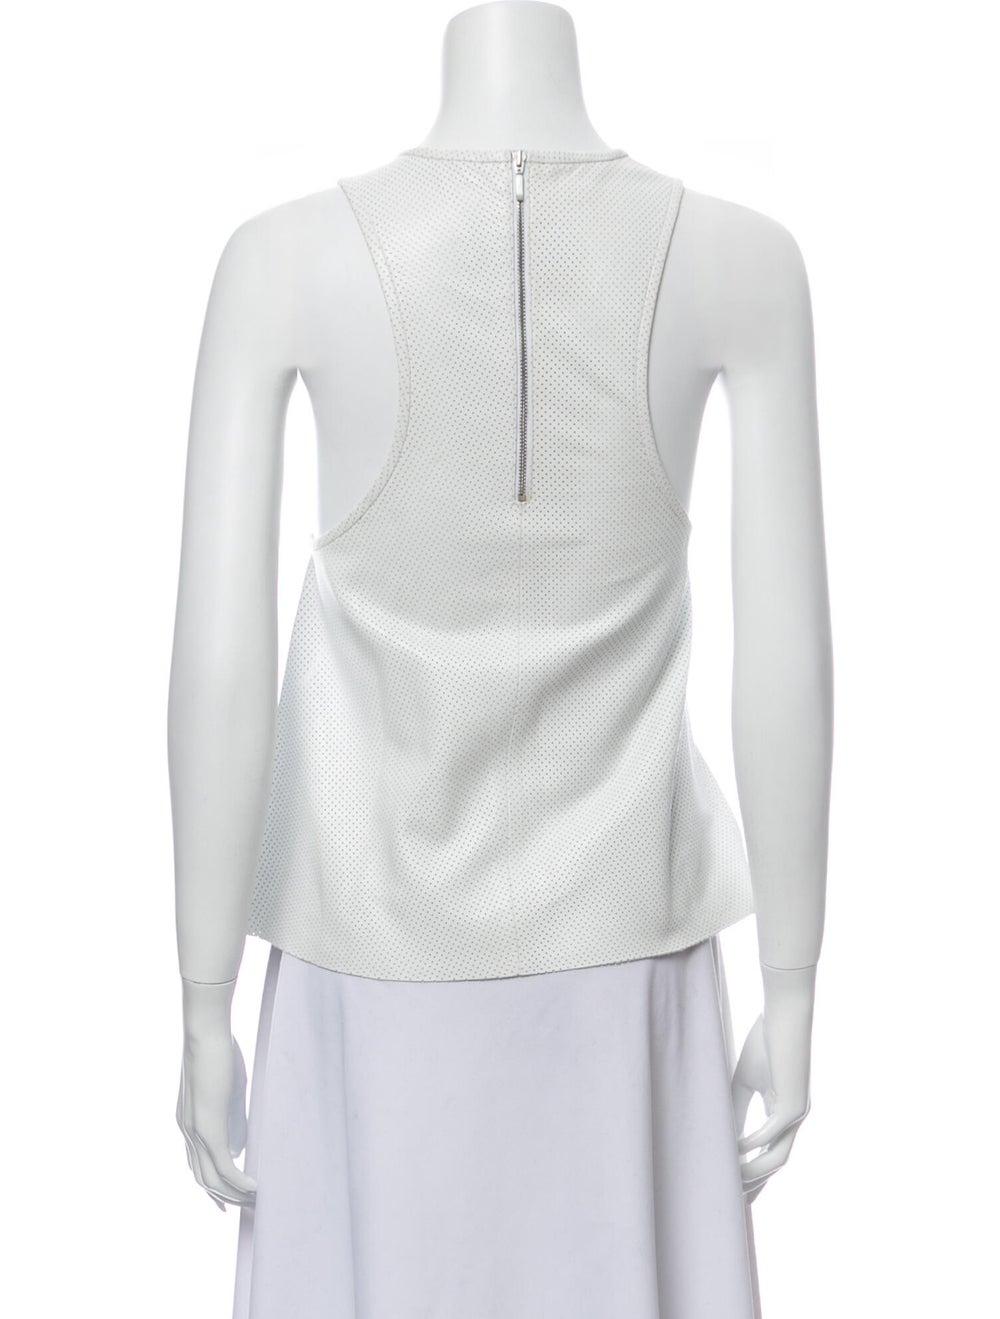 Anine Bing Scoop Neck Sleeveless Top White - image 3